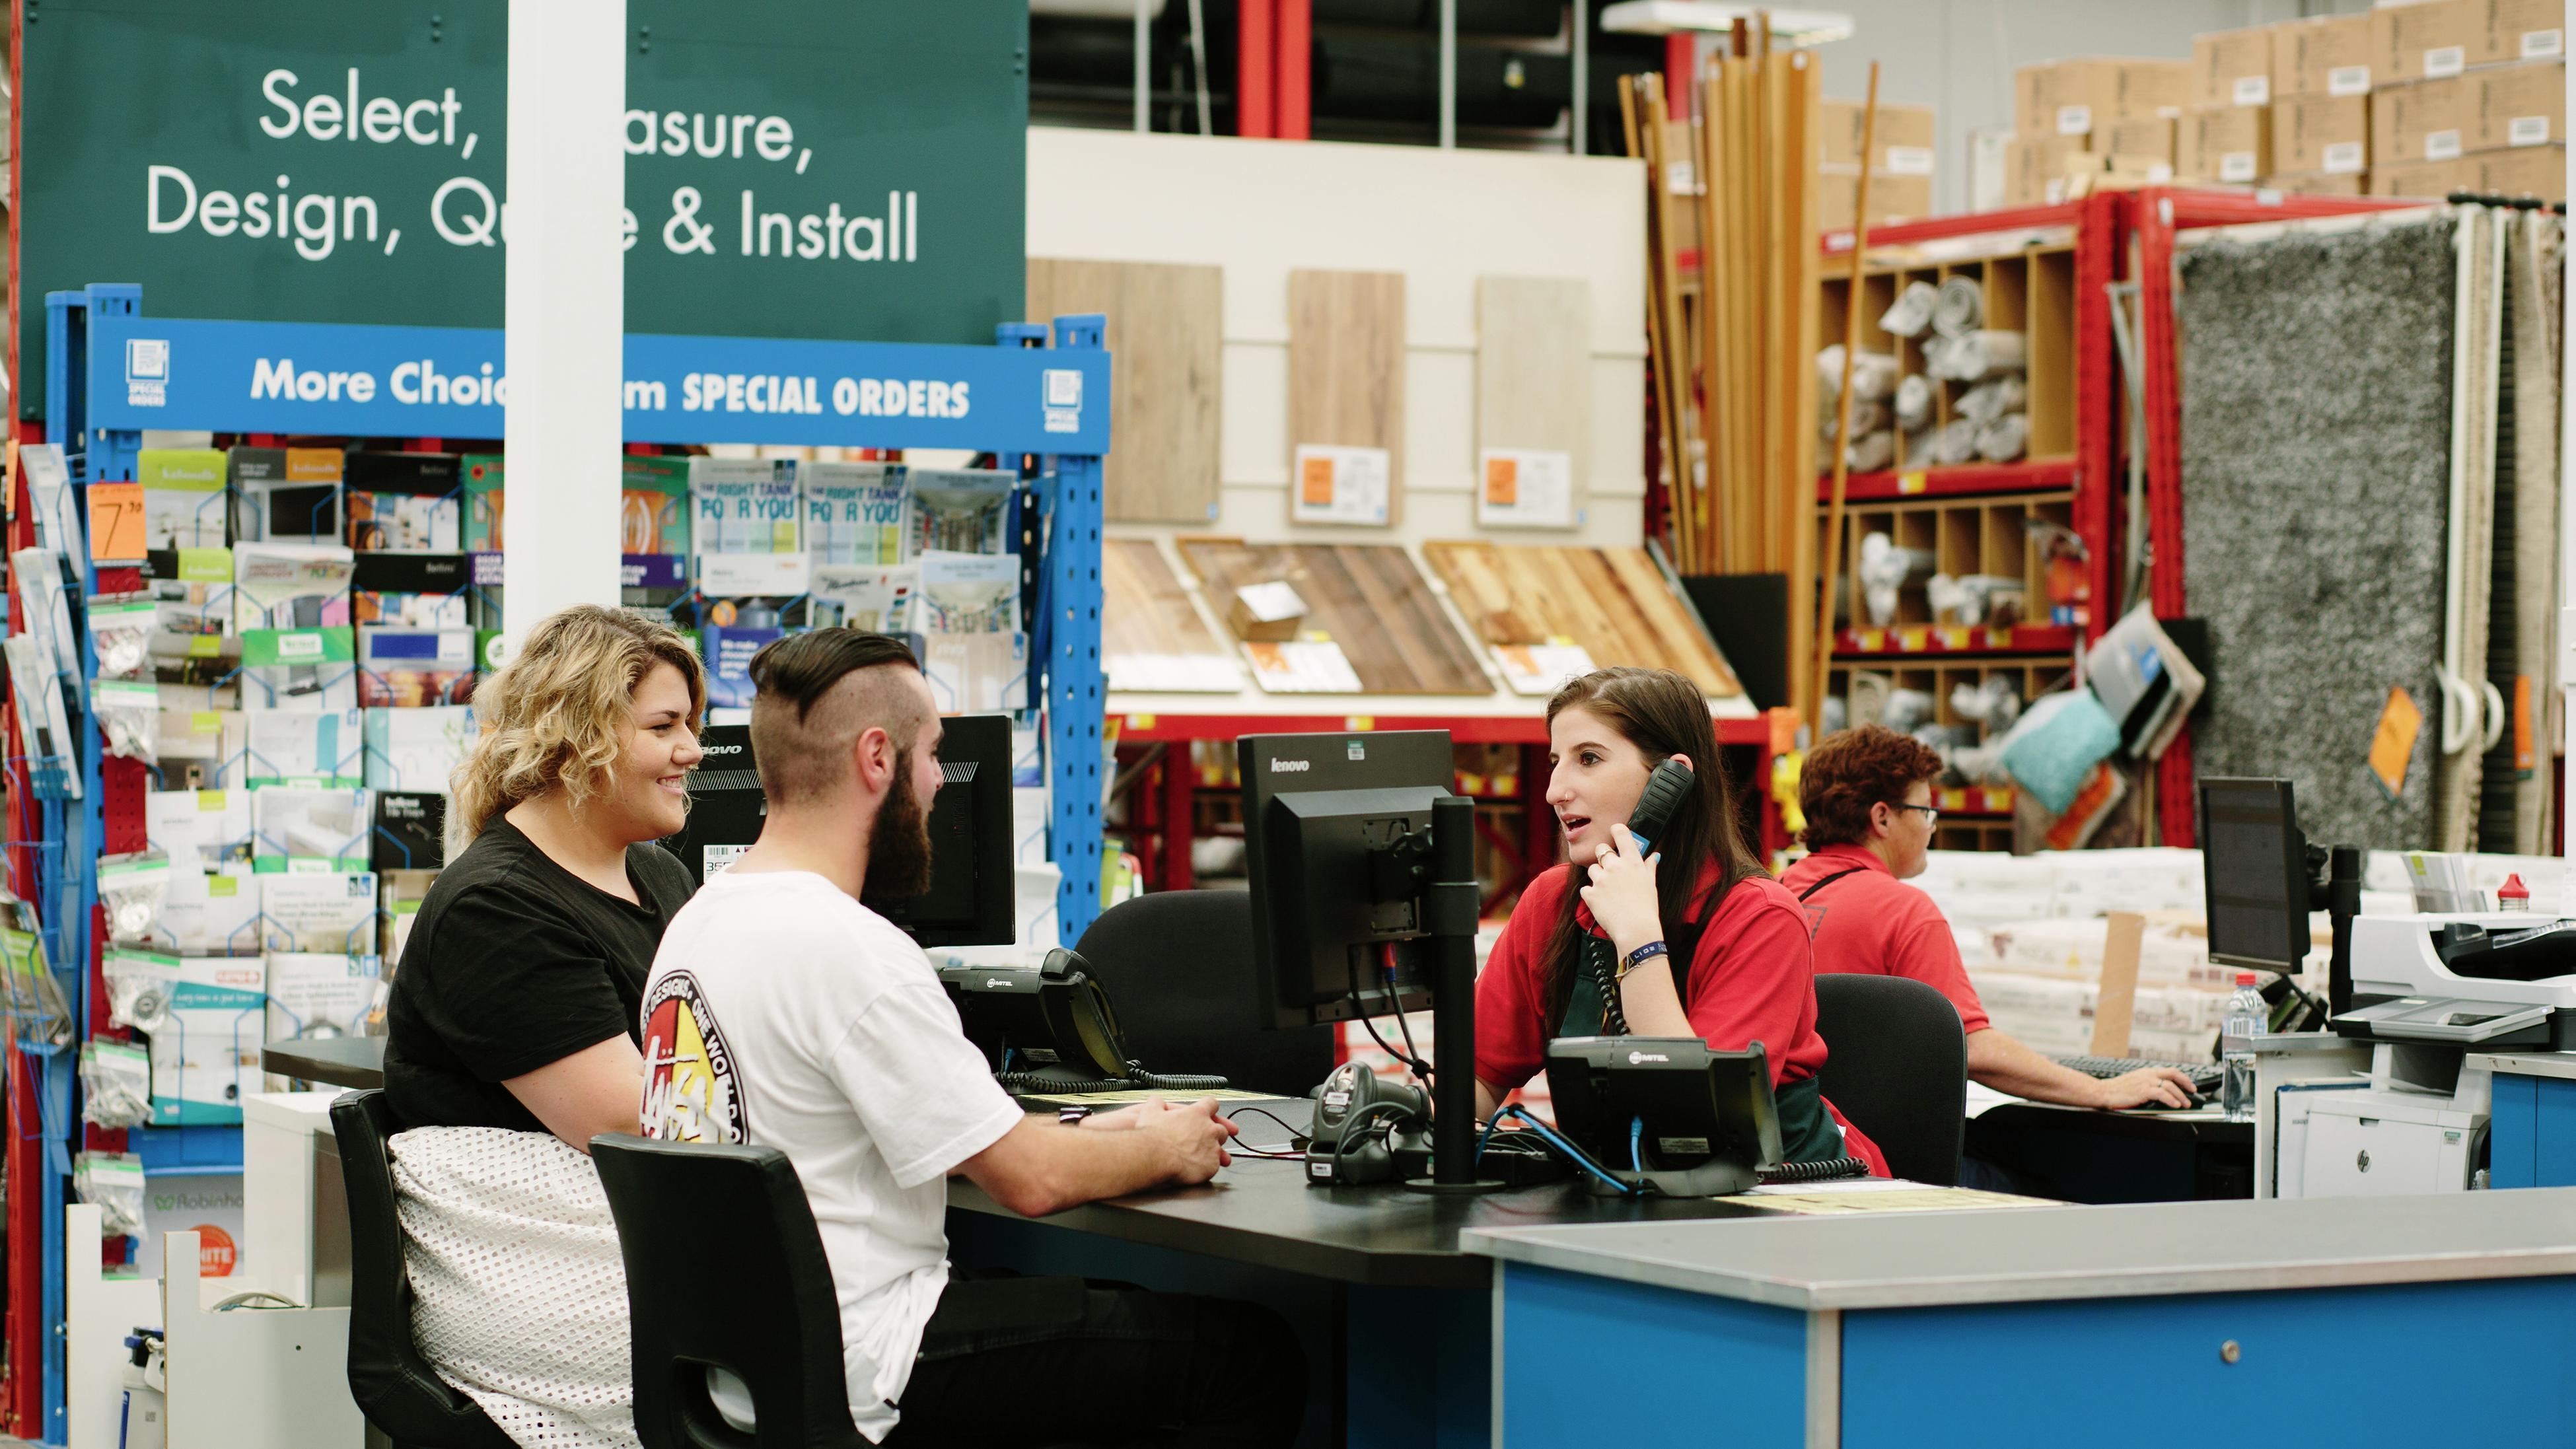 VIC Metro - Mentone - 6400 - Warehouse - Special Orders counter